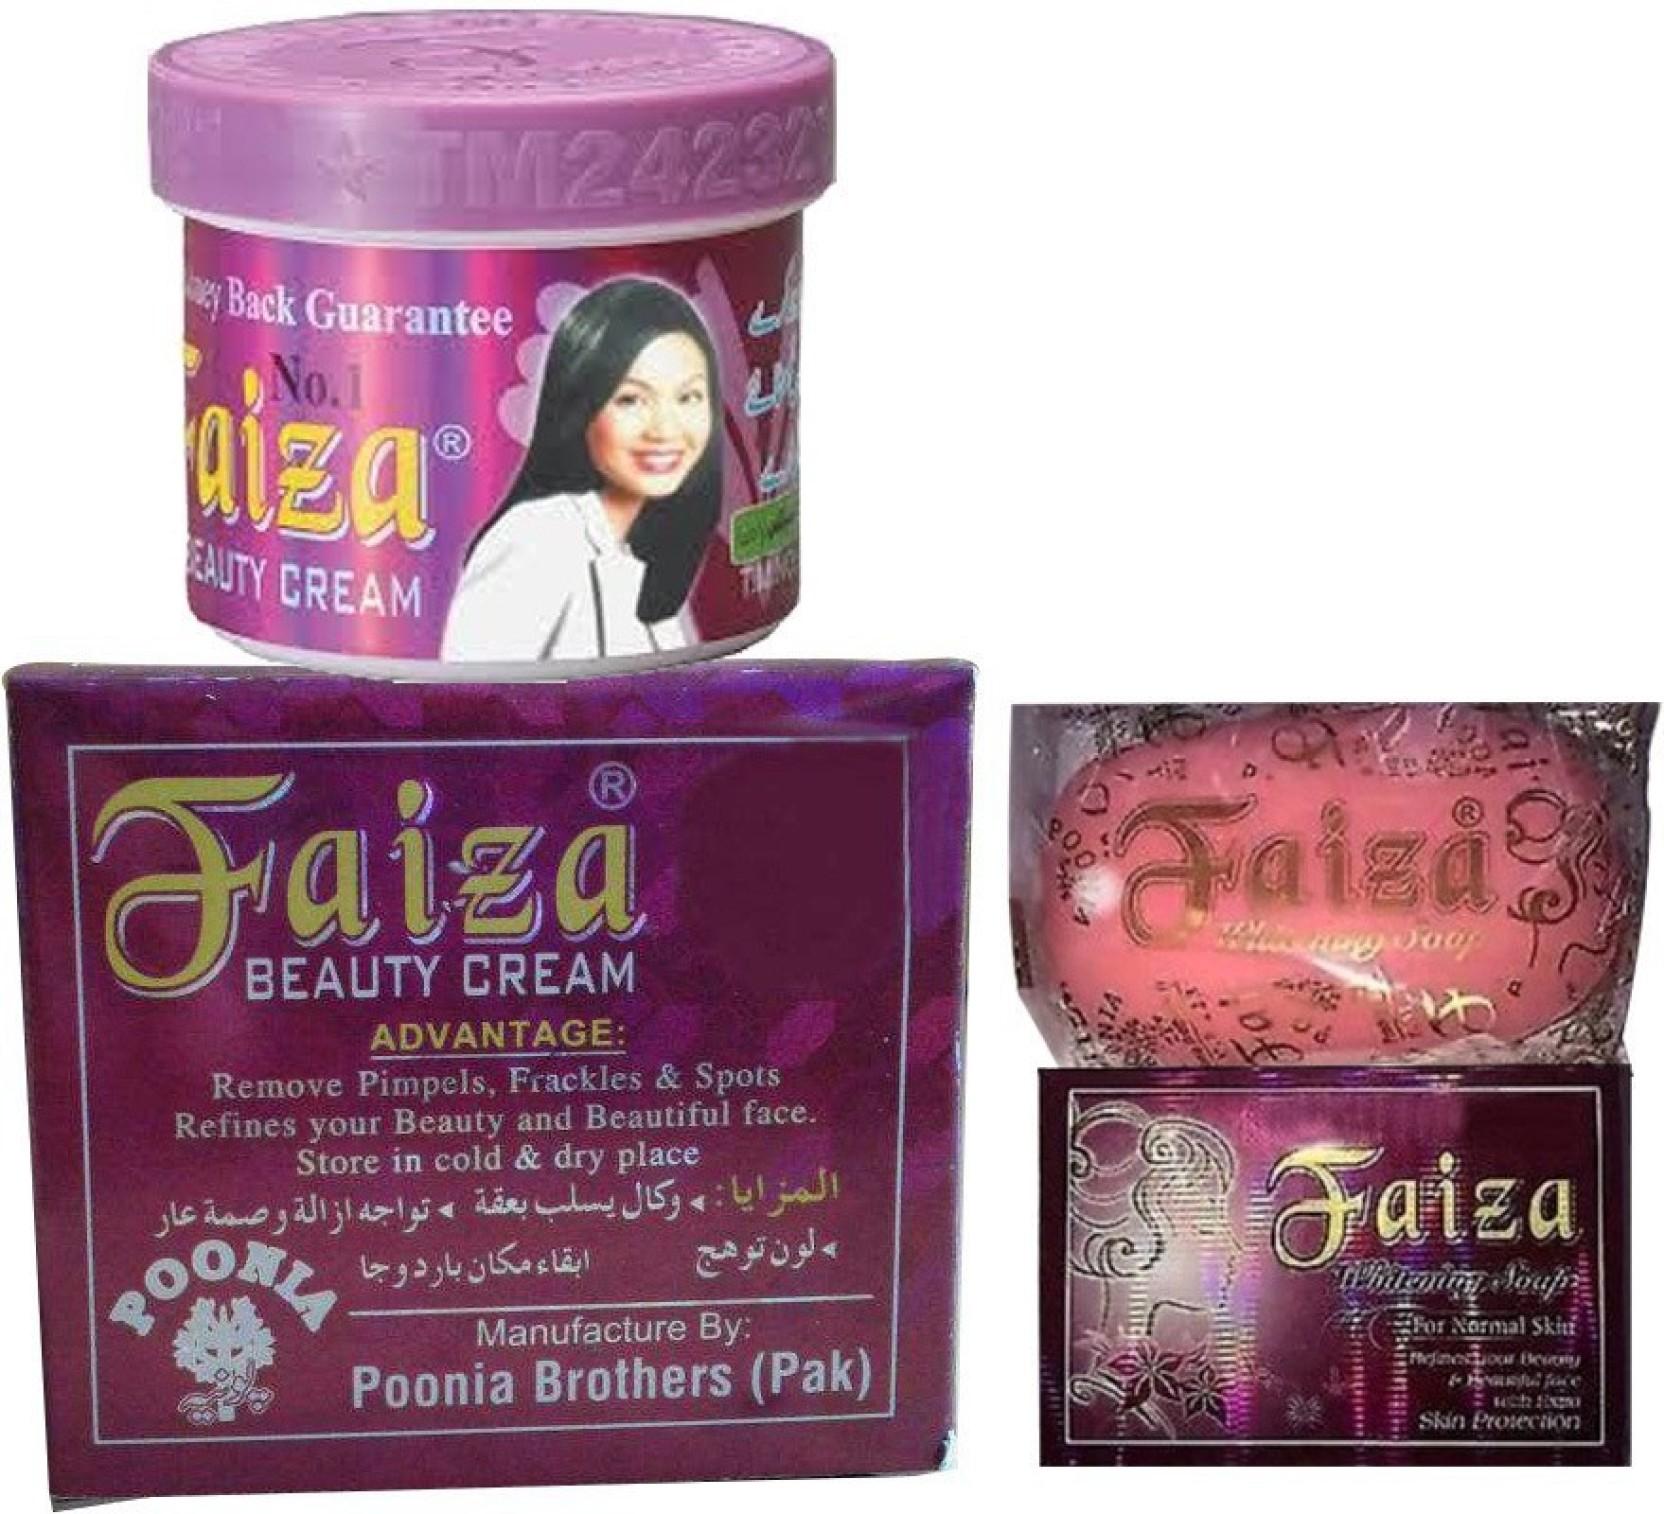 Faiza Beauty Cream Whitening Soap Price In India Buy Walet Black Original Box Diamond Add To Cart